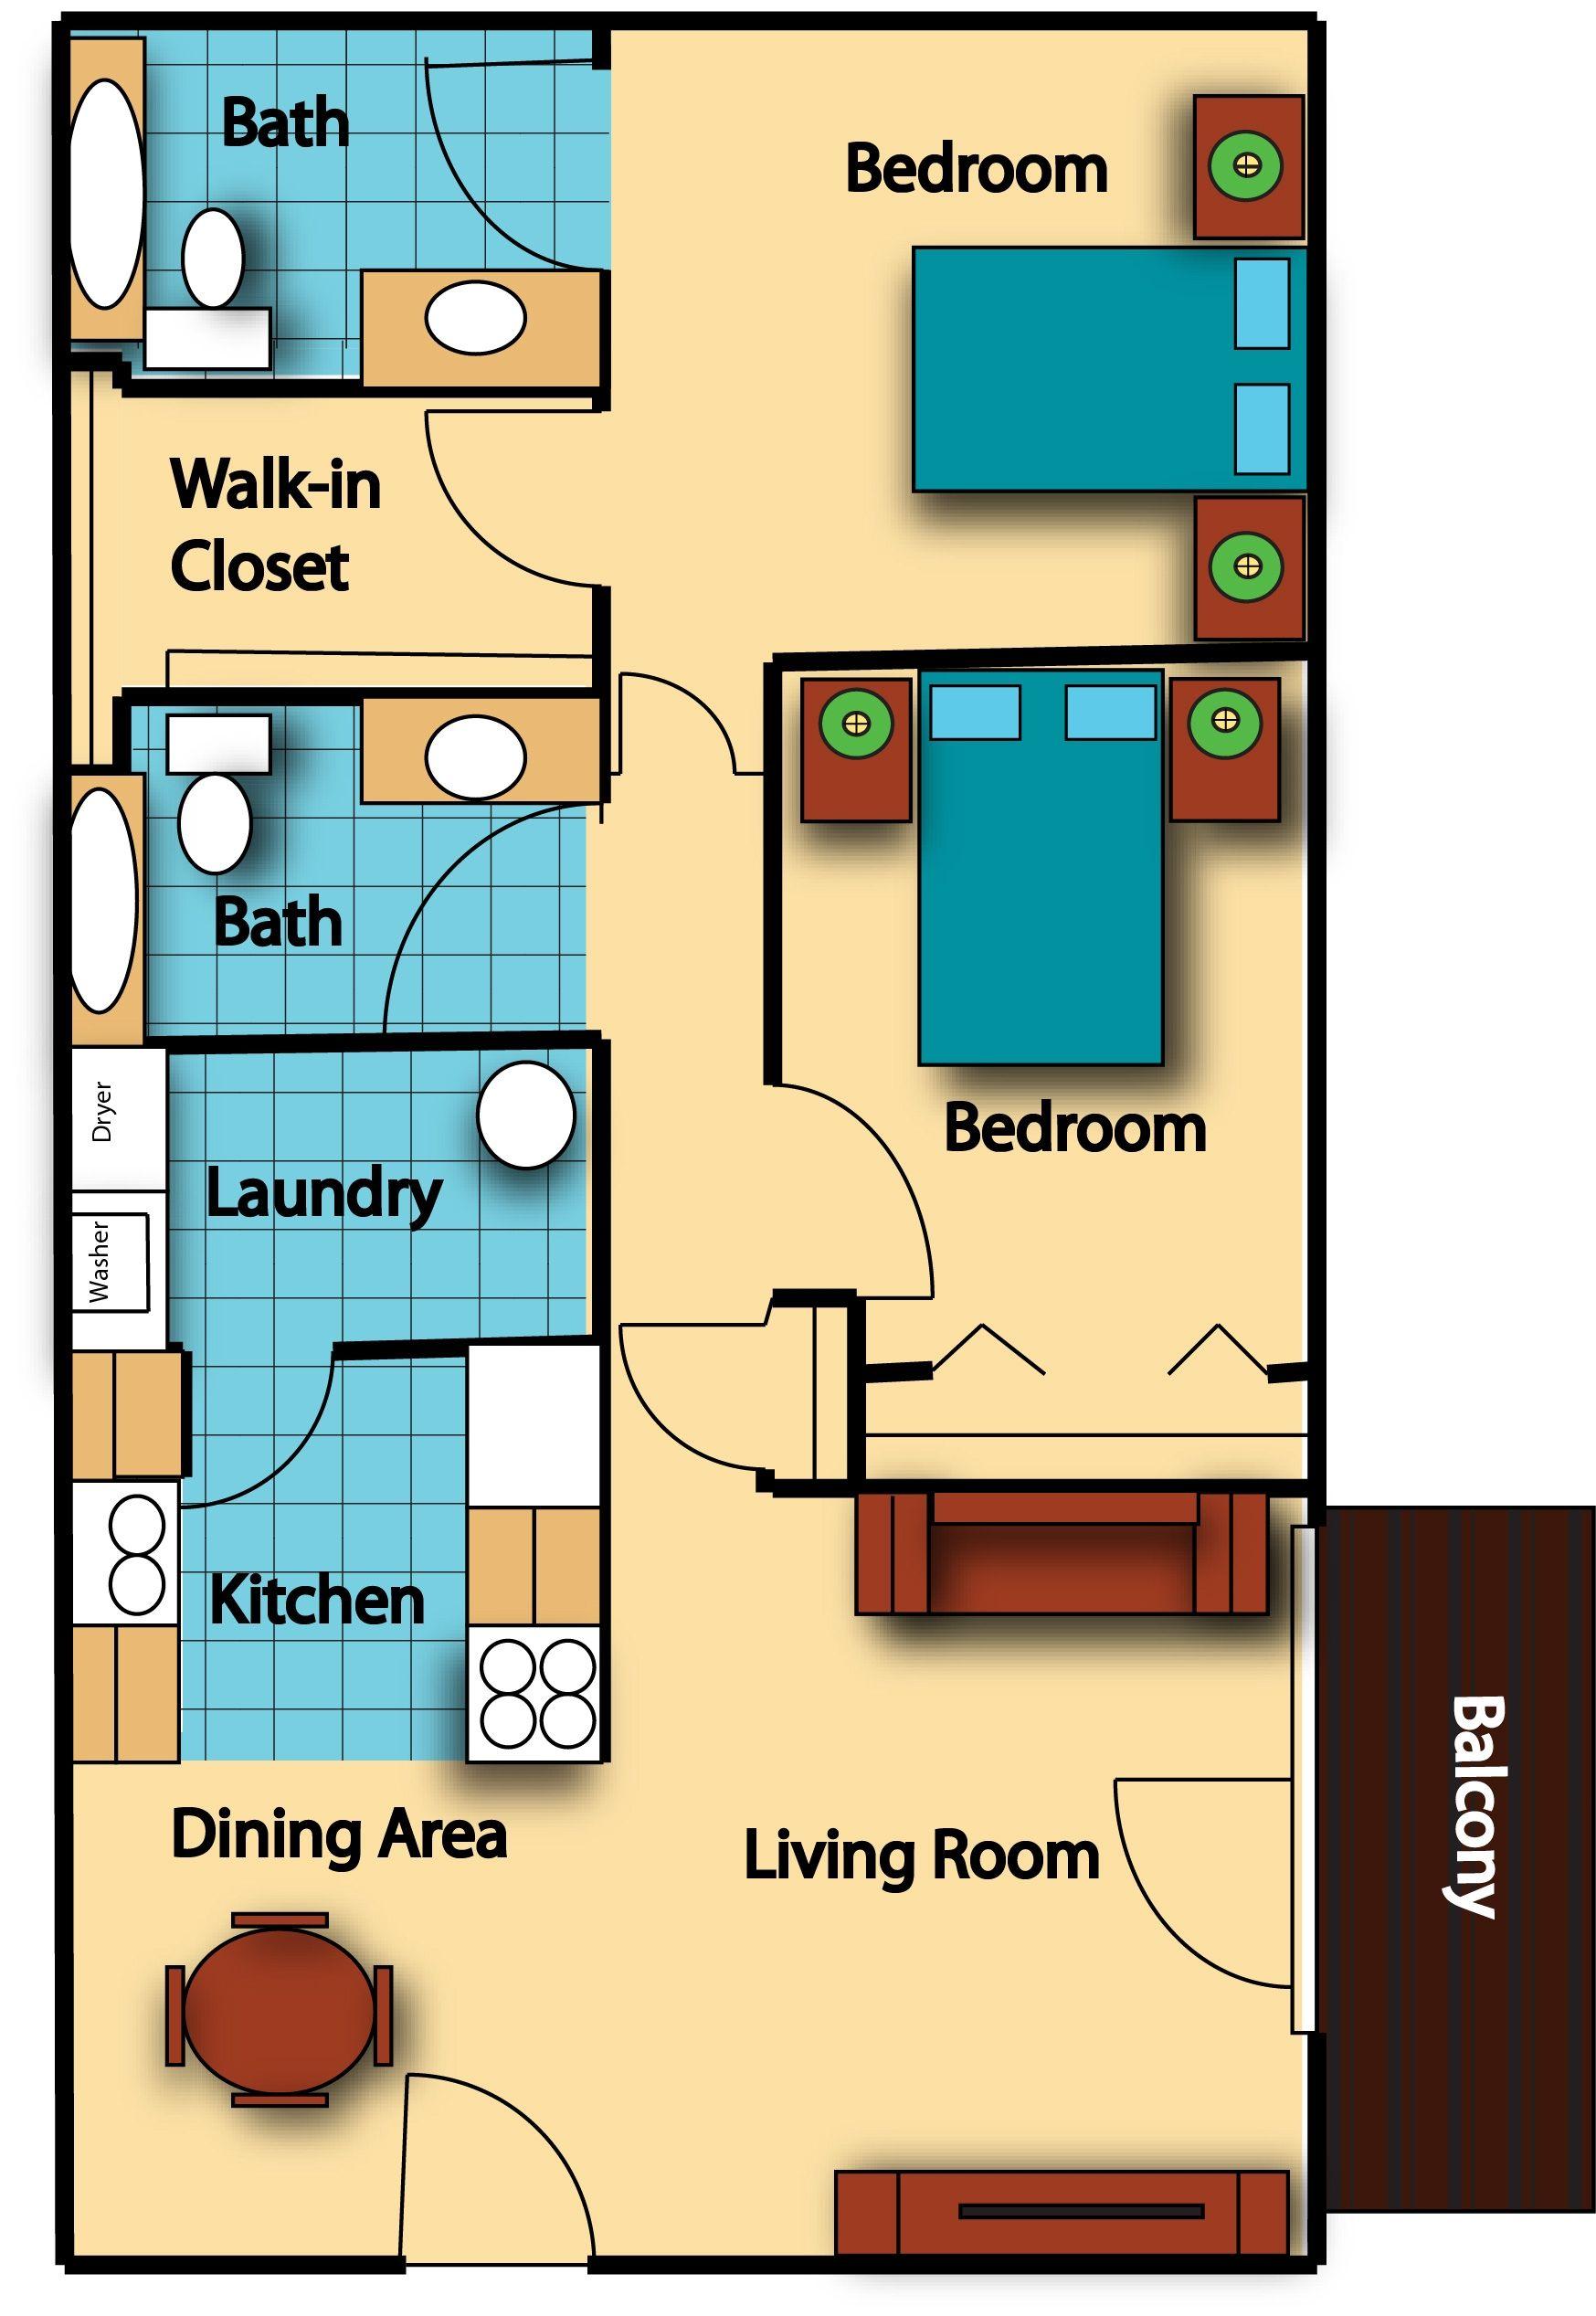 2 bedroom 2 bath 900 sq ft house plans Springbrook